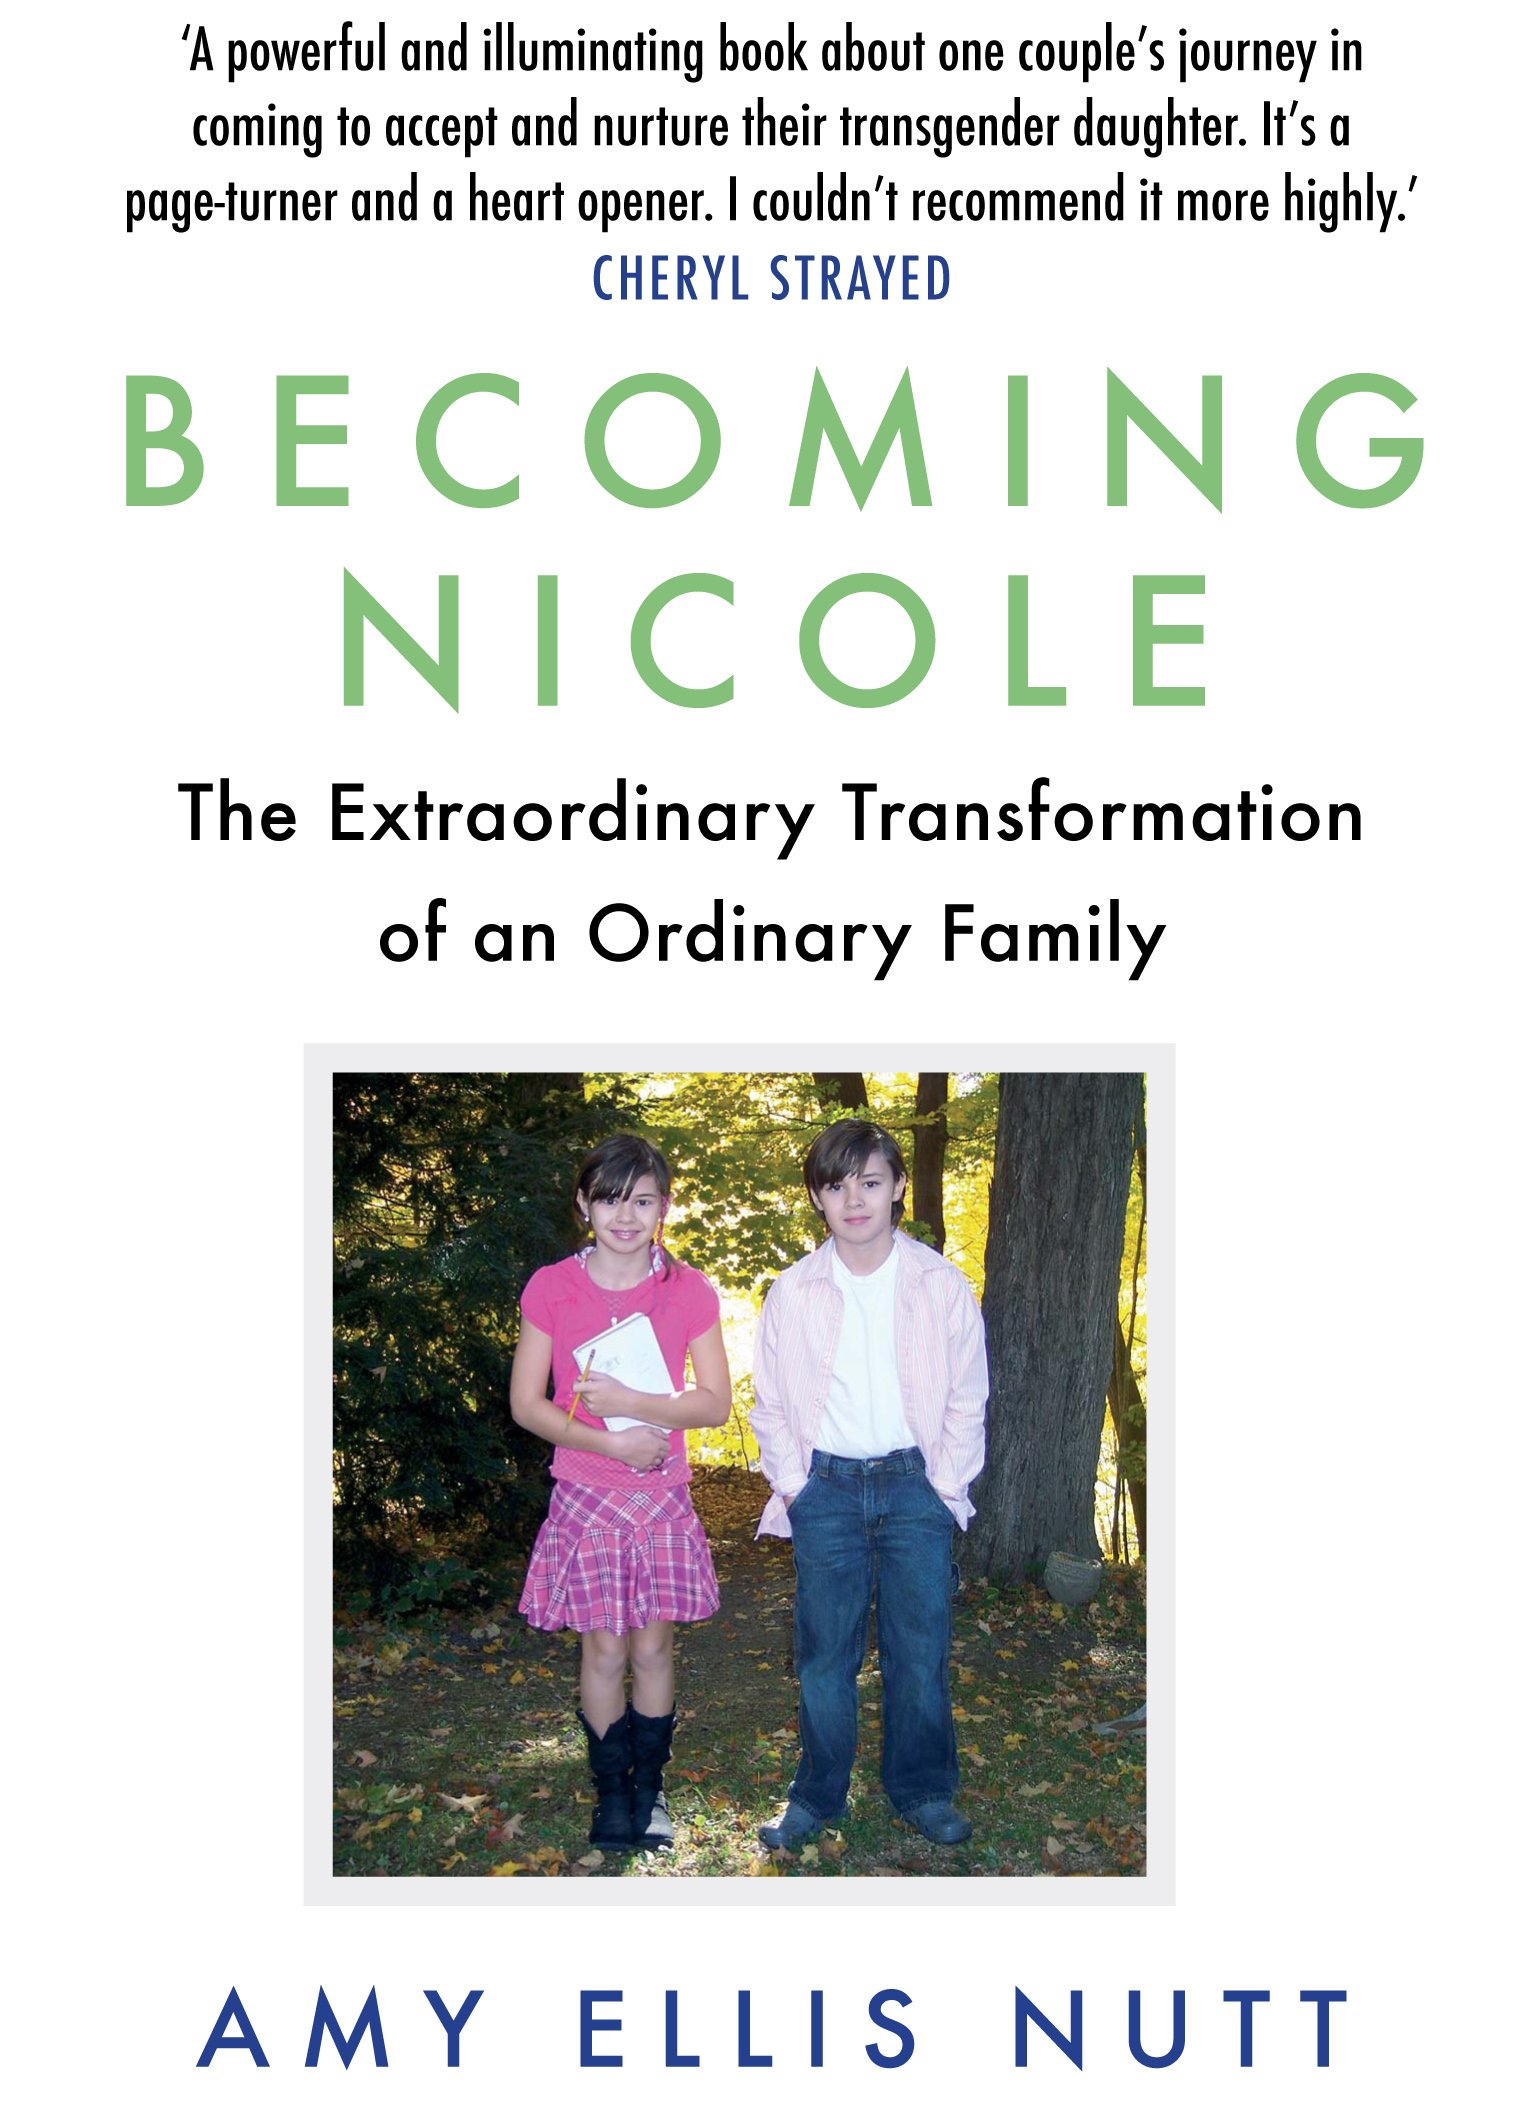 Becoming Nicole : The Extraordinary Transformation of an Ordinary Family (Anglais) Broché – 2 février 2017 Amy Ellis Nutt Atlantic Books 1786490323 Belletristik / Biographien